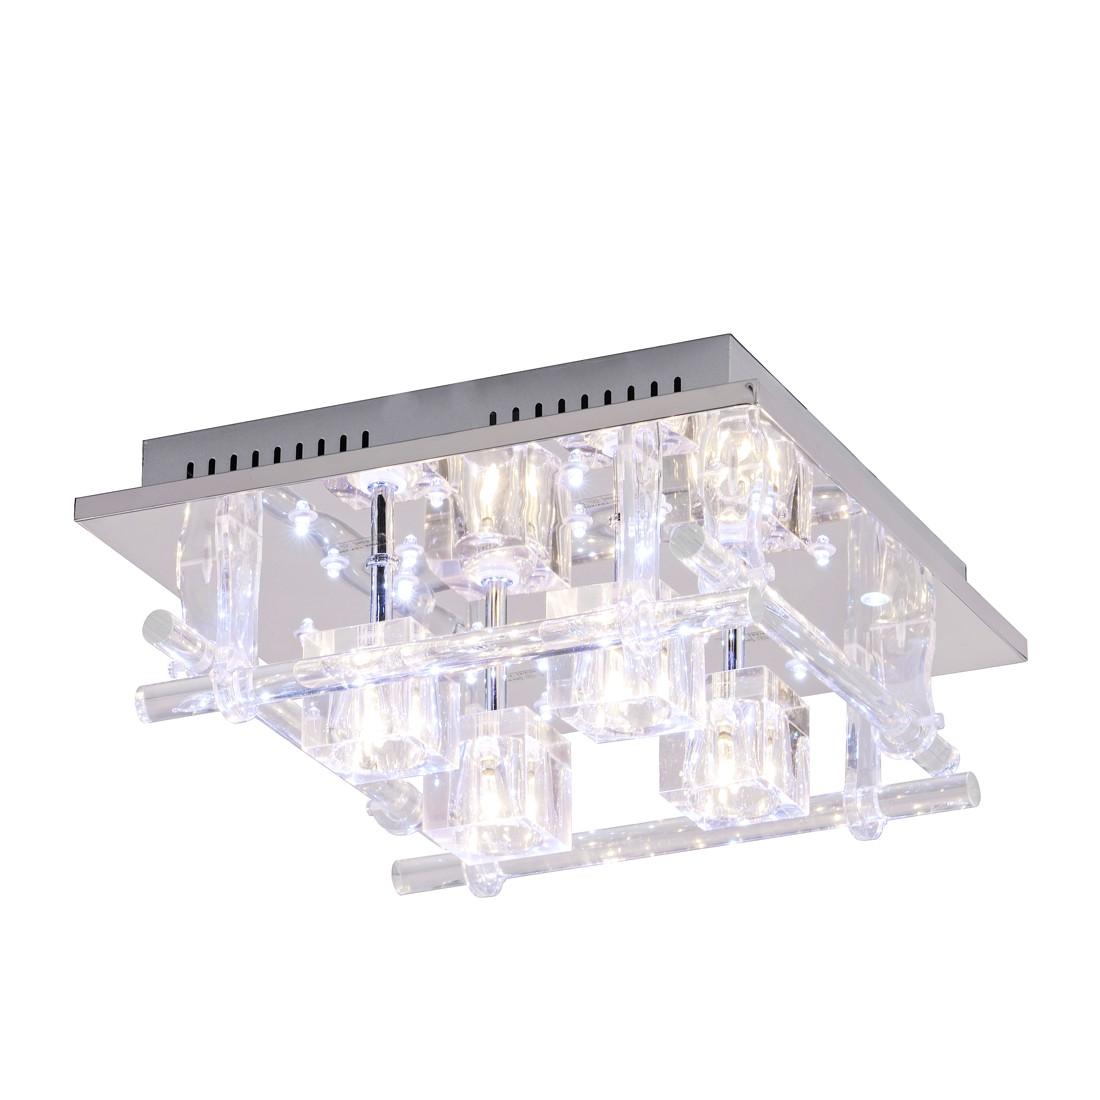 EEK B, Plafonnier LED Kemal - Métal / Verre Argenté, Leuchten Direkt